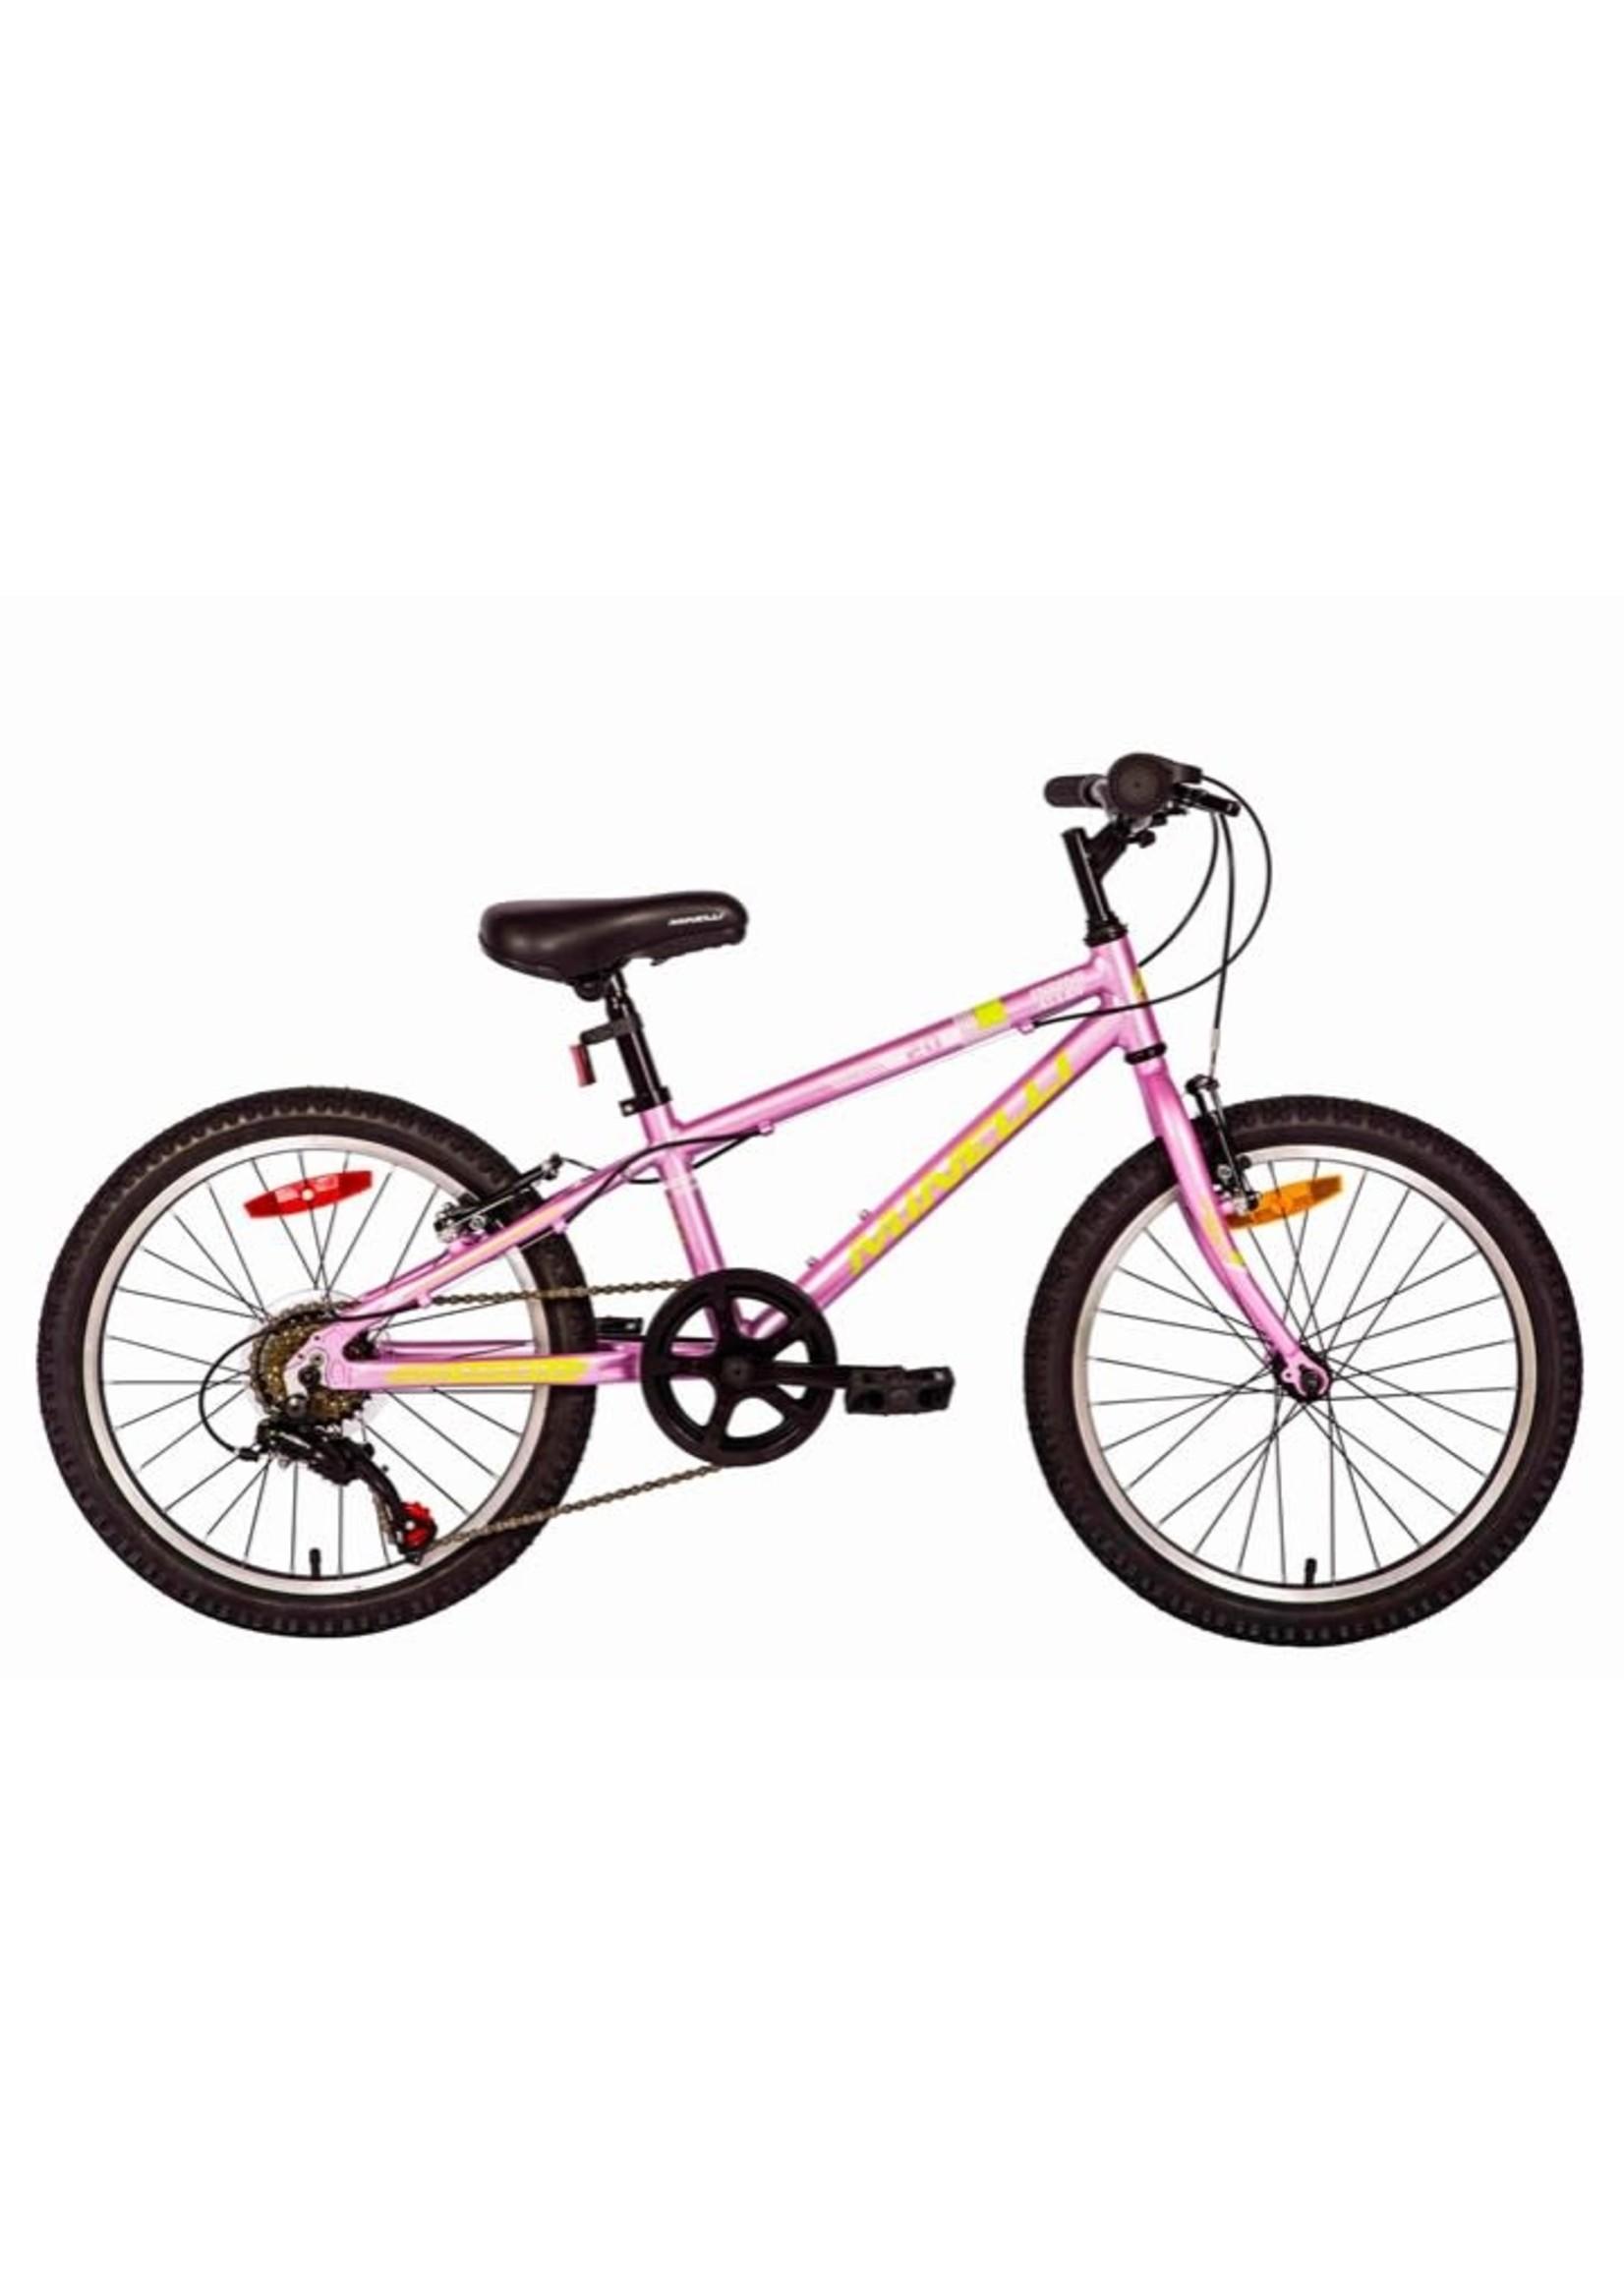 "MINELLI Vélo Indigo Alloy 20"" - Rose"